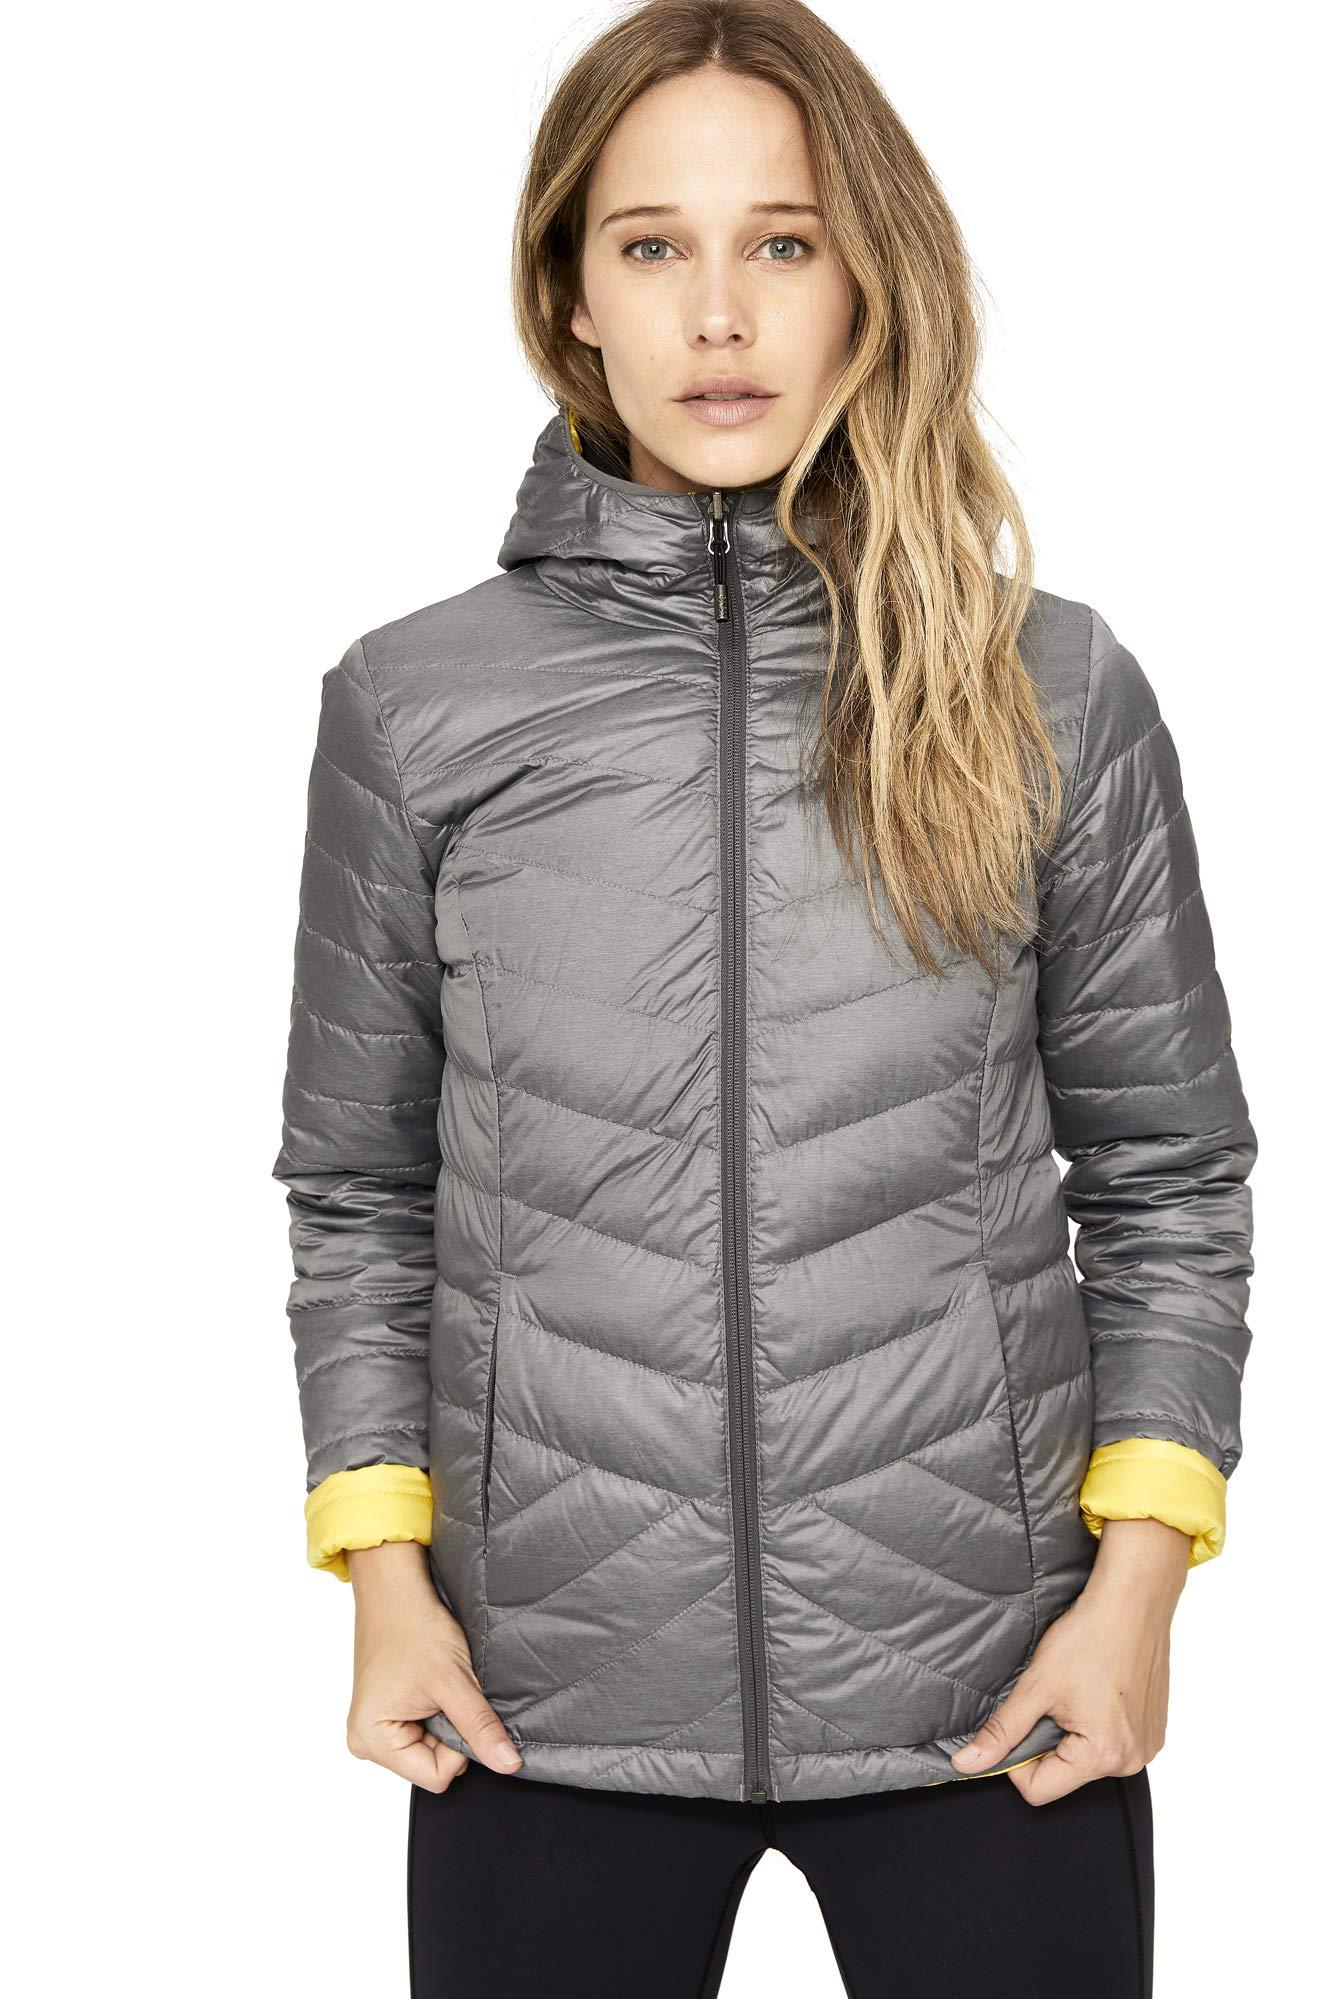 Lole Women's Emeline Reversible Jacket, X-Large, Medium Grey Heather by Lole